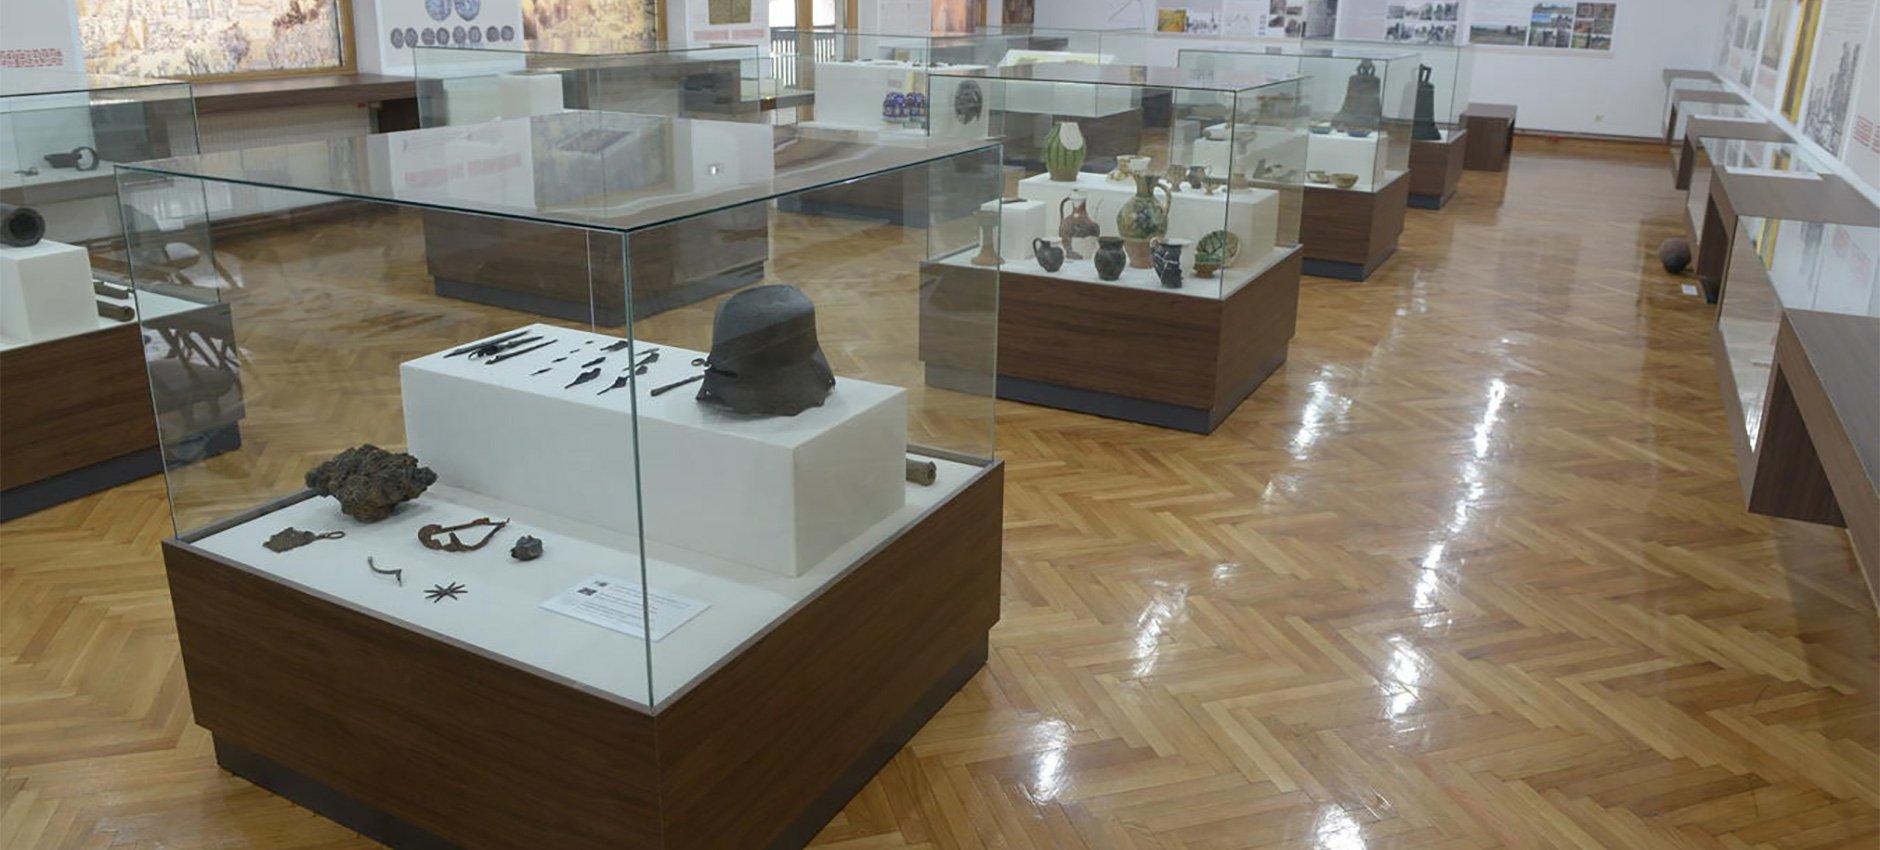 smederevo-muzej-18.jpg